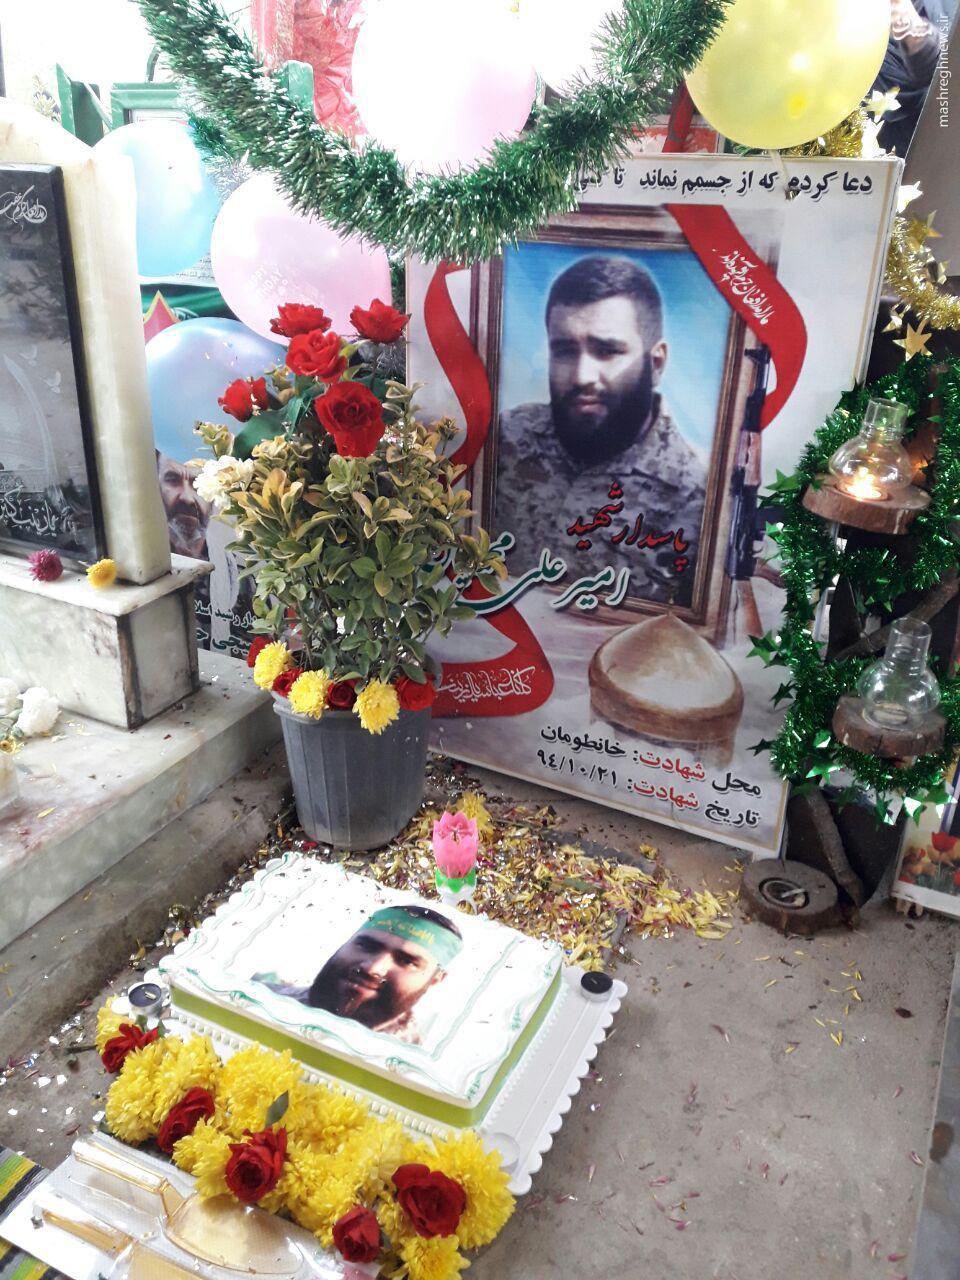 جشن تولد شهیدی که هنوز پیکرش به وطن بازنگشته + عکس